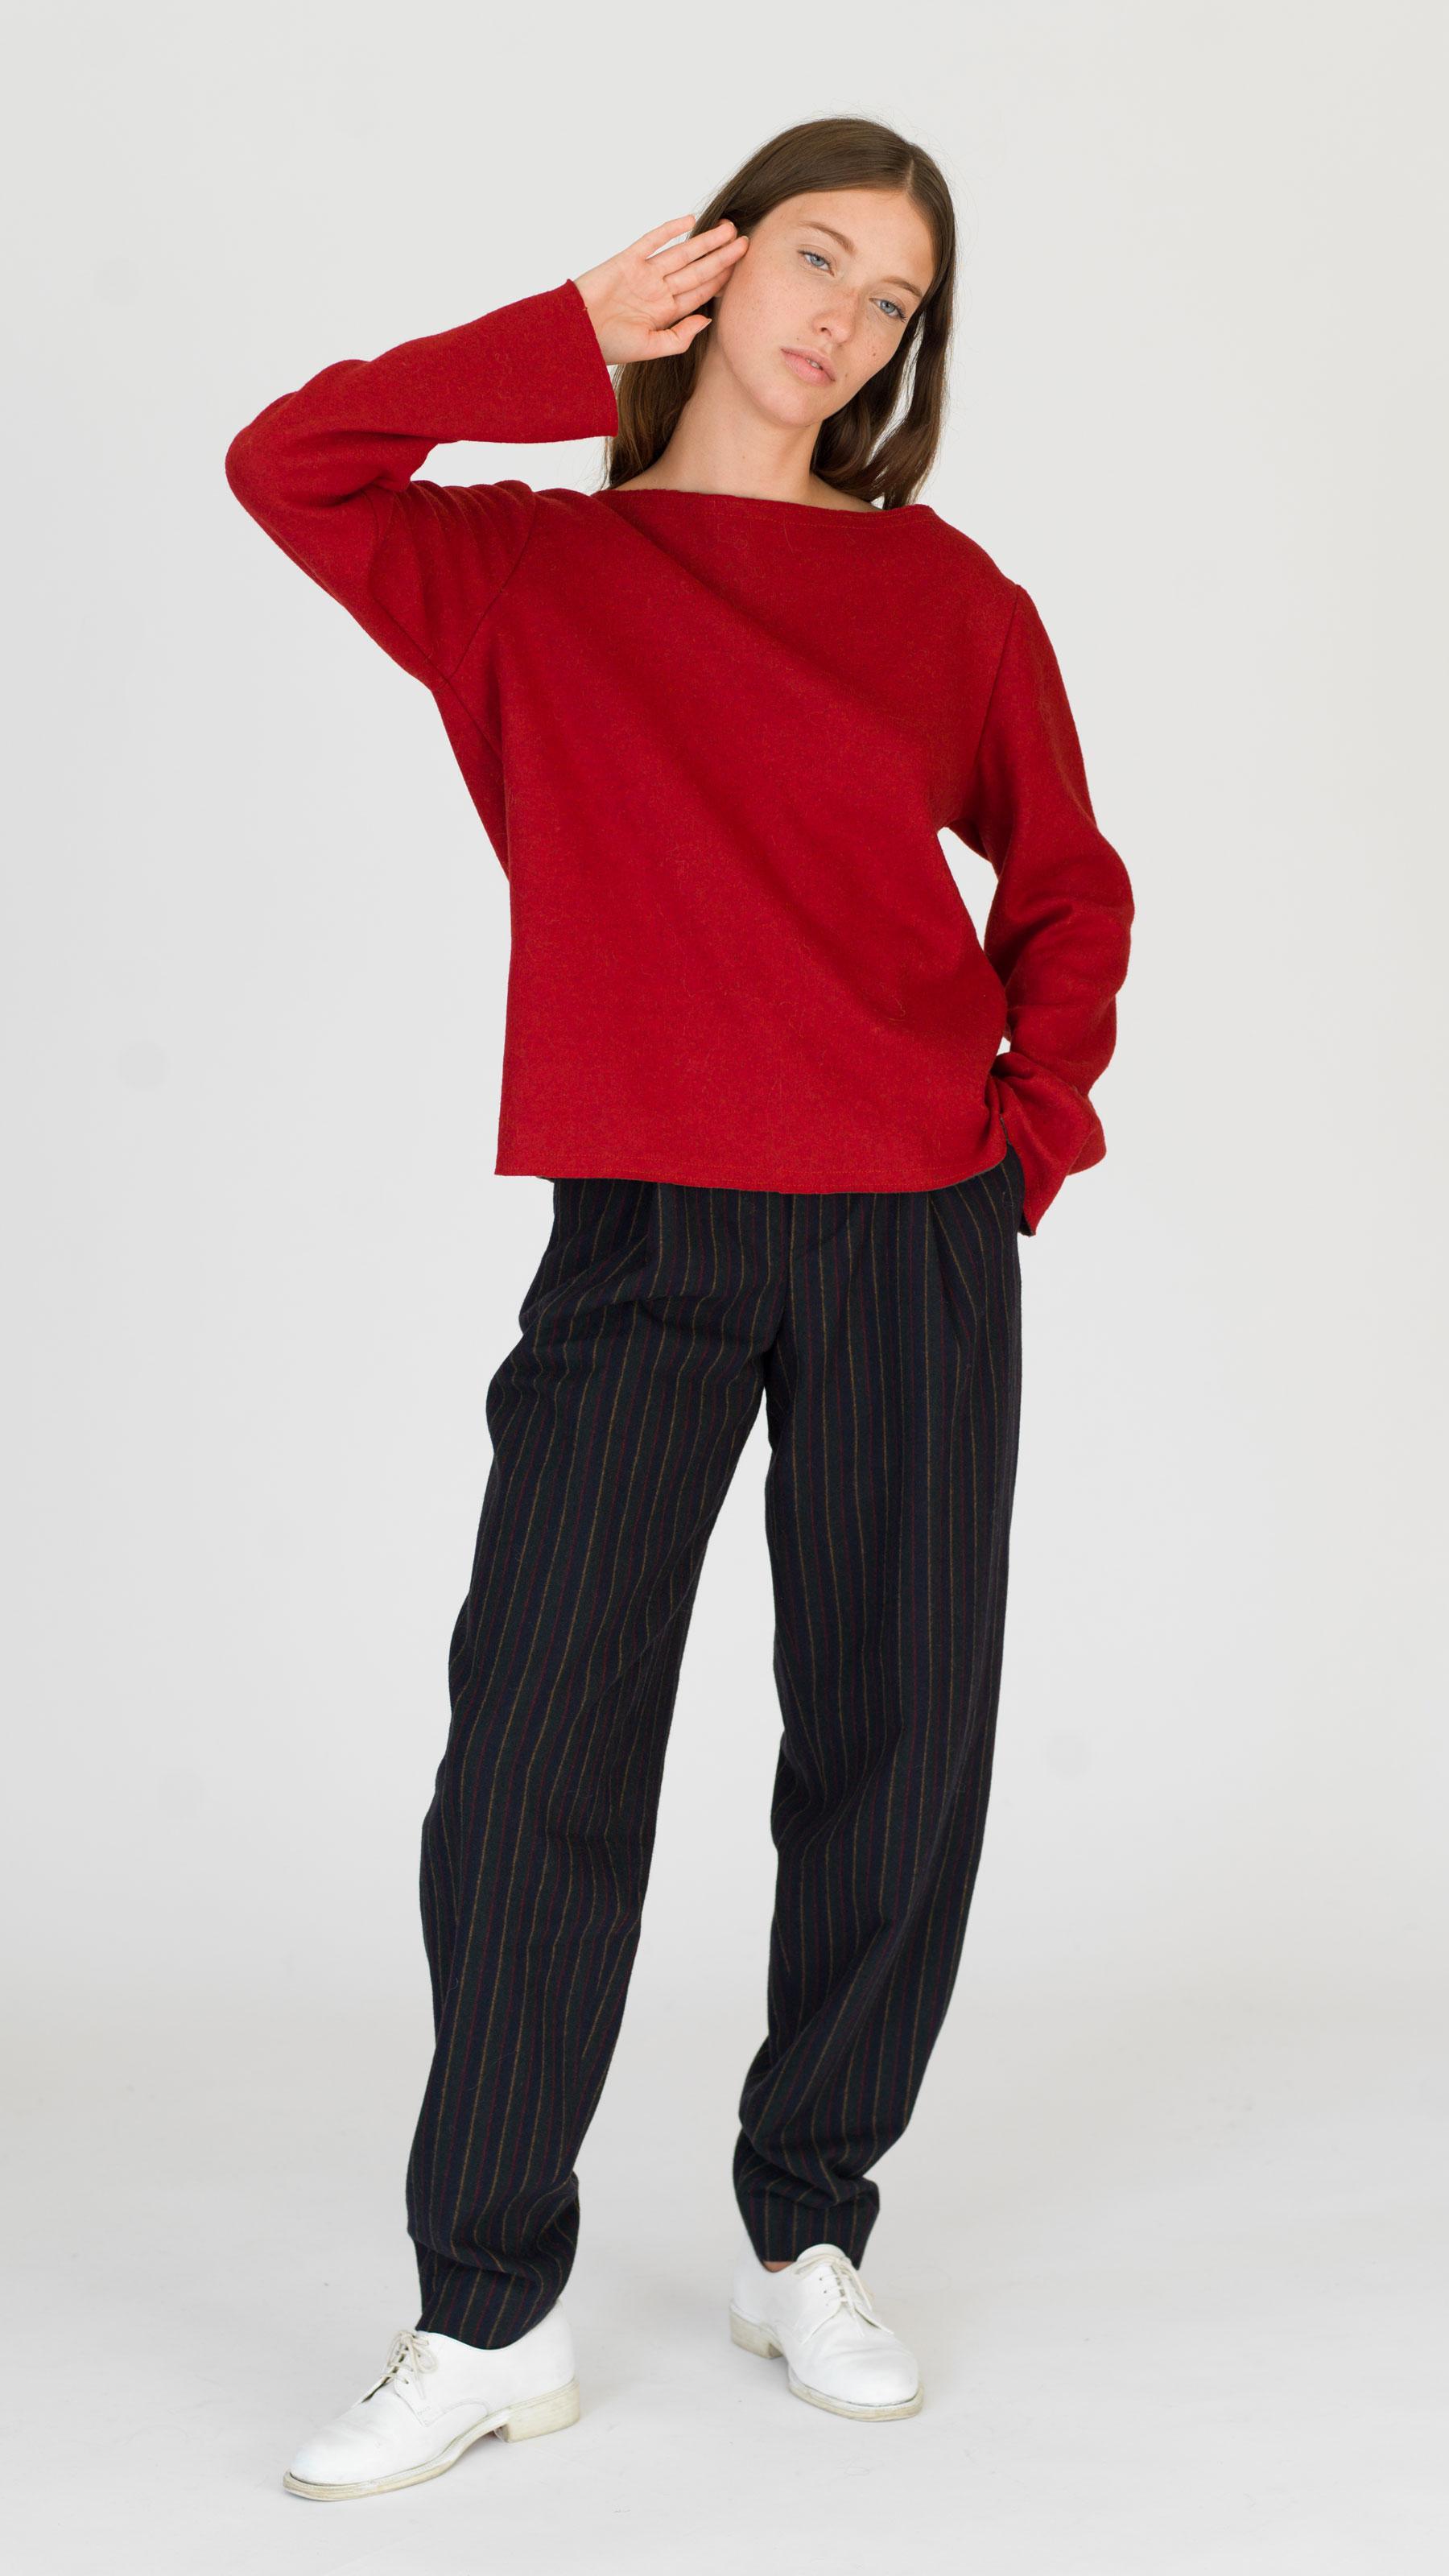 dada-diane-ducasse-pull-bateau-jersey-rouge-khaki-ah-17-face